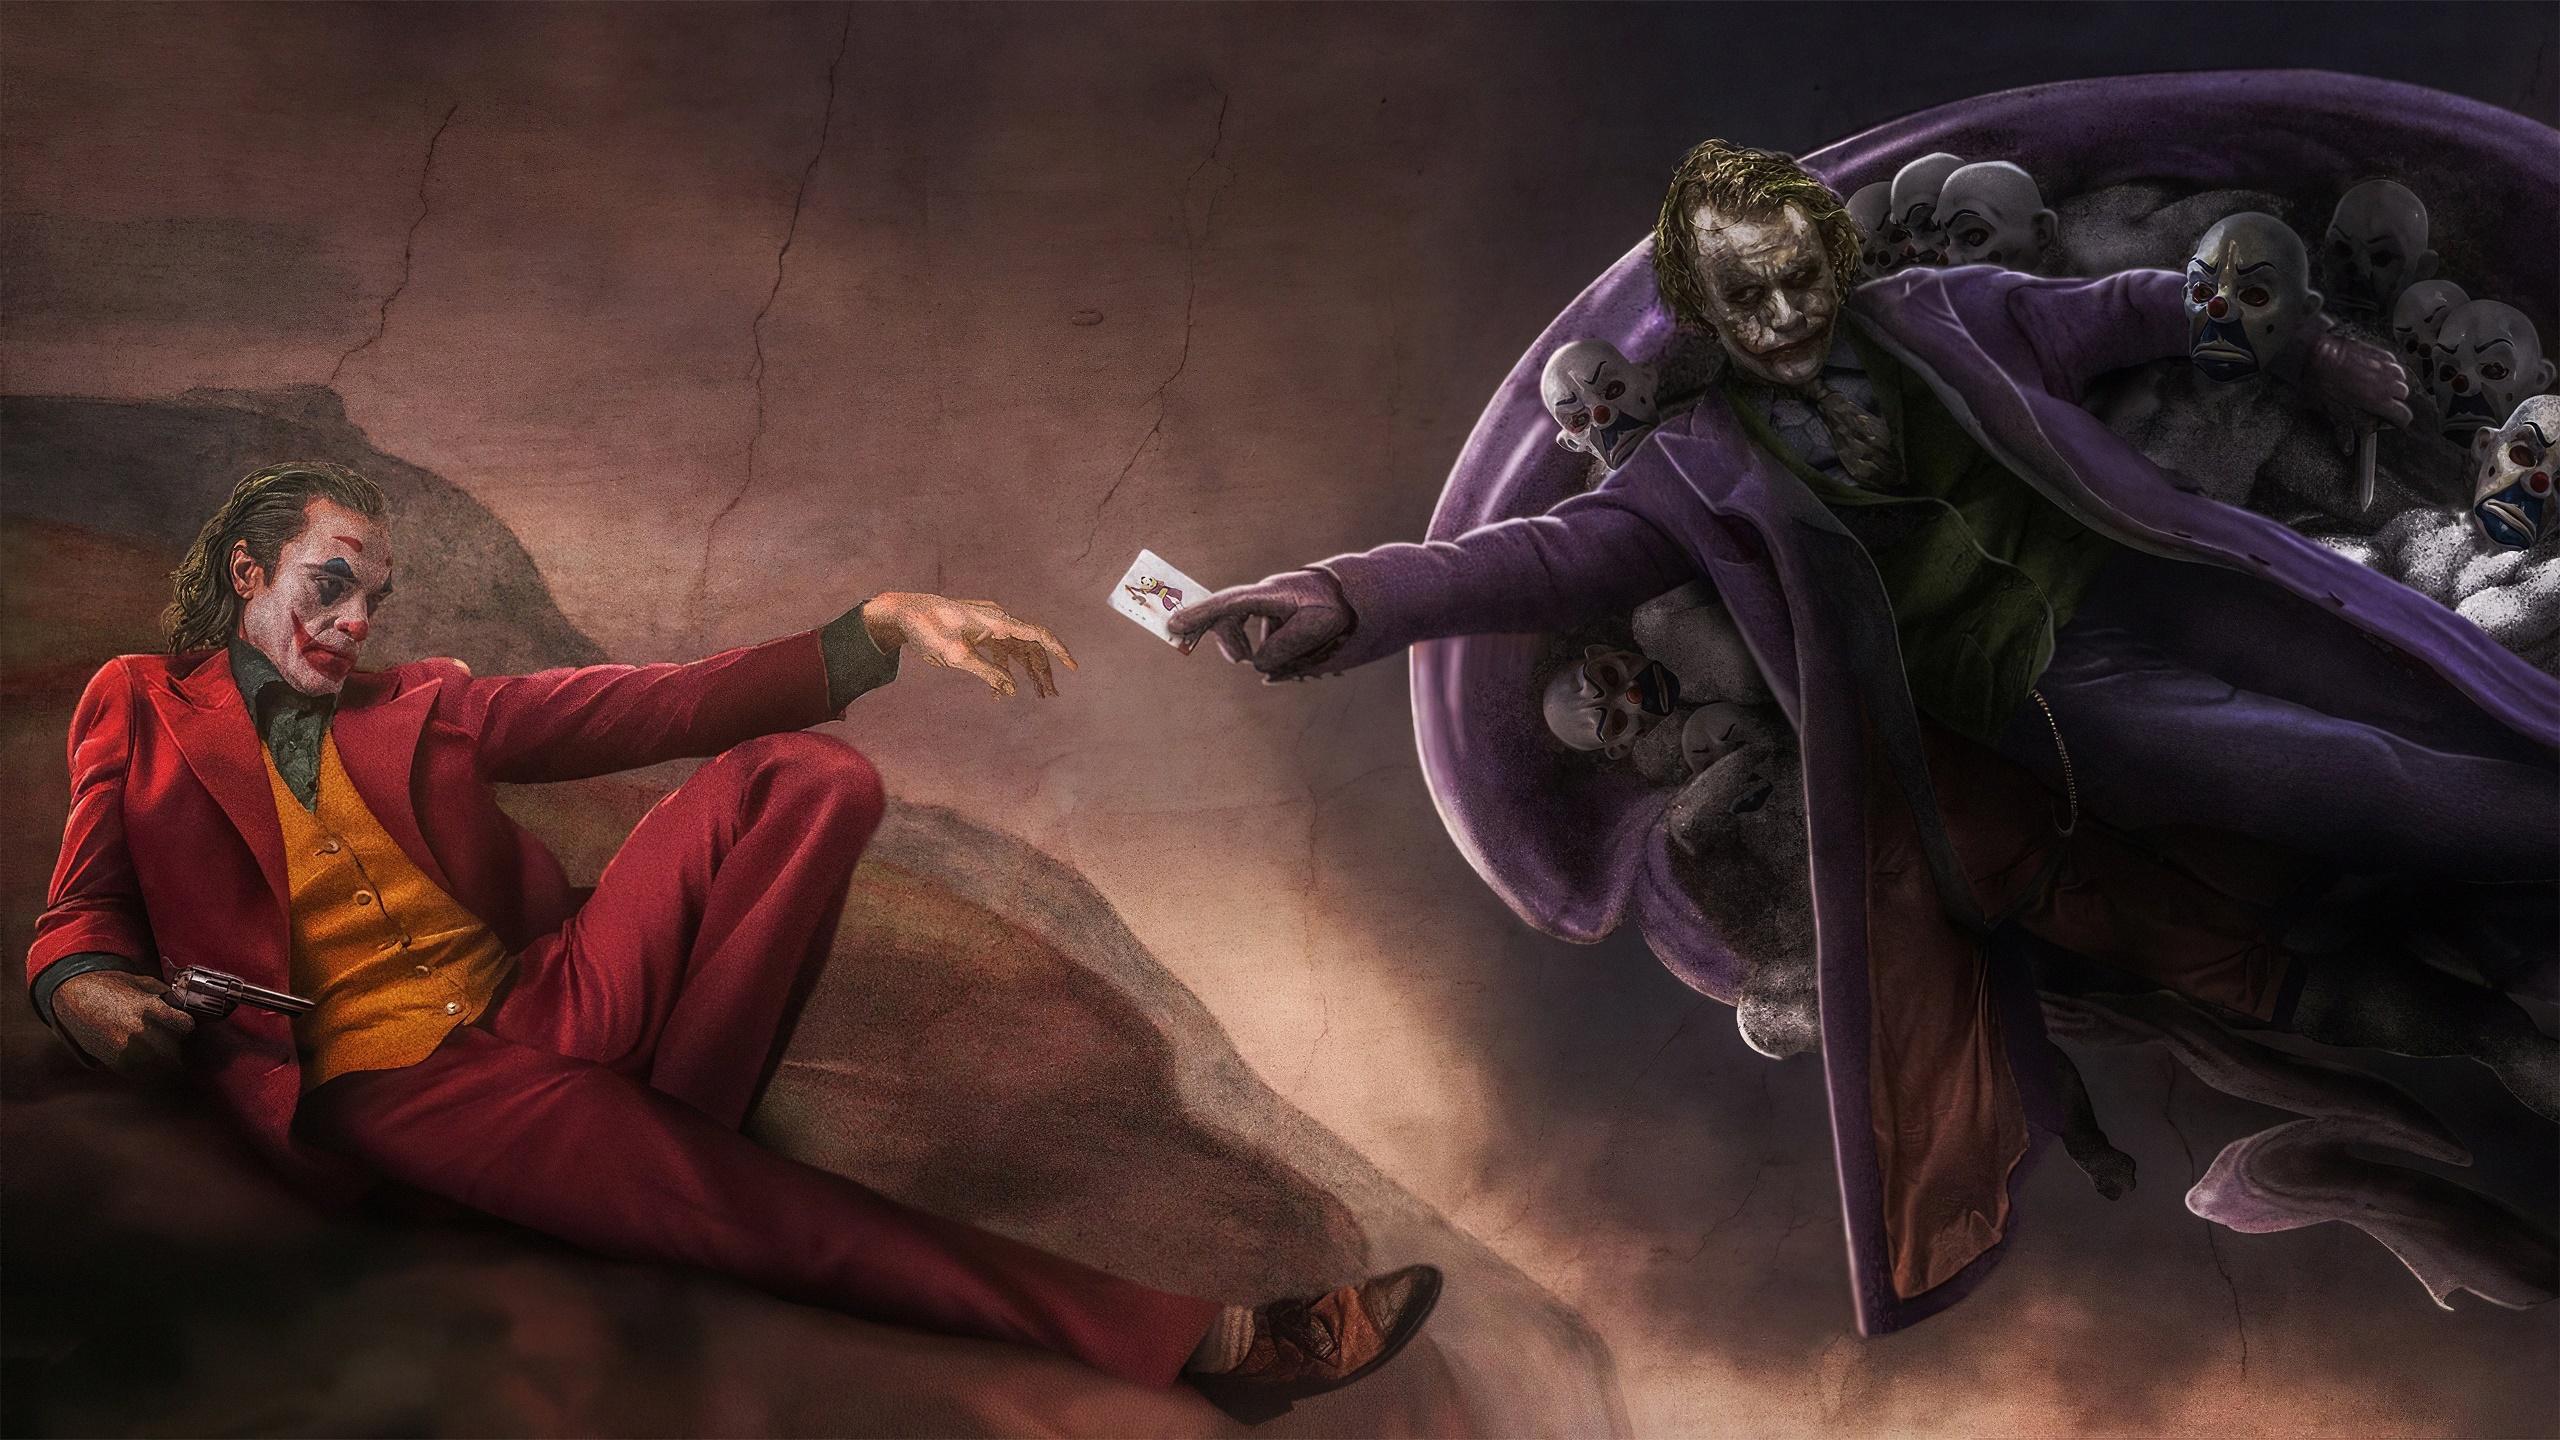 General 2560x1440 artwork movies Joker Heath Ledger Joaquin Phoenix pistol DC Comics parody